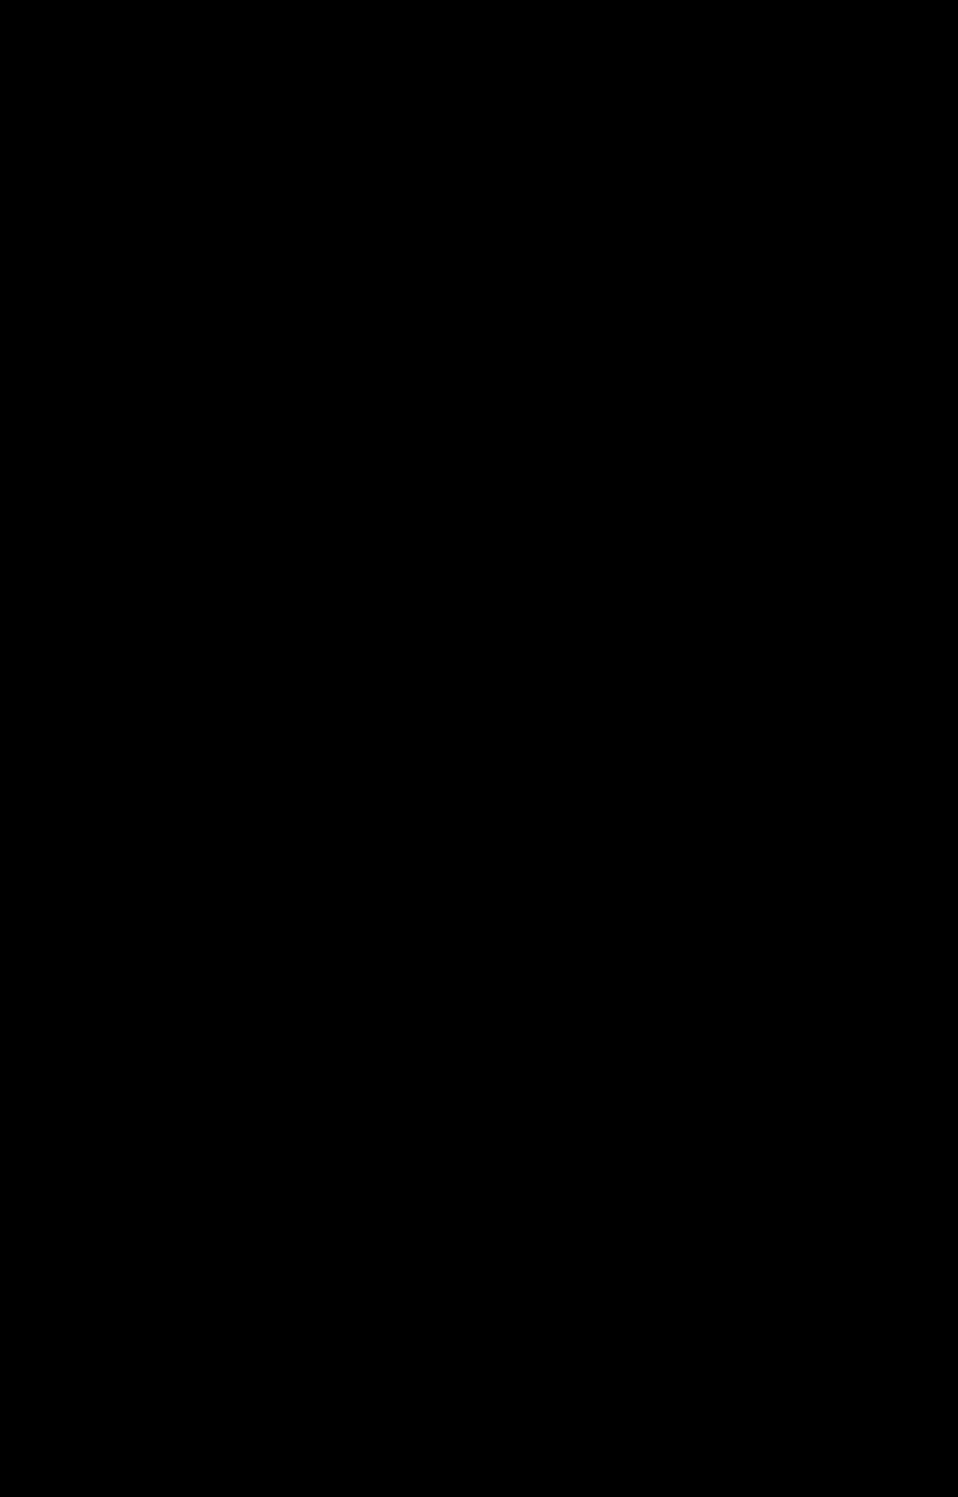 Public domain clip art. Karate clipart black and white